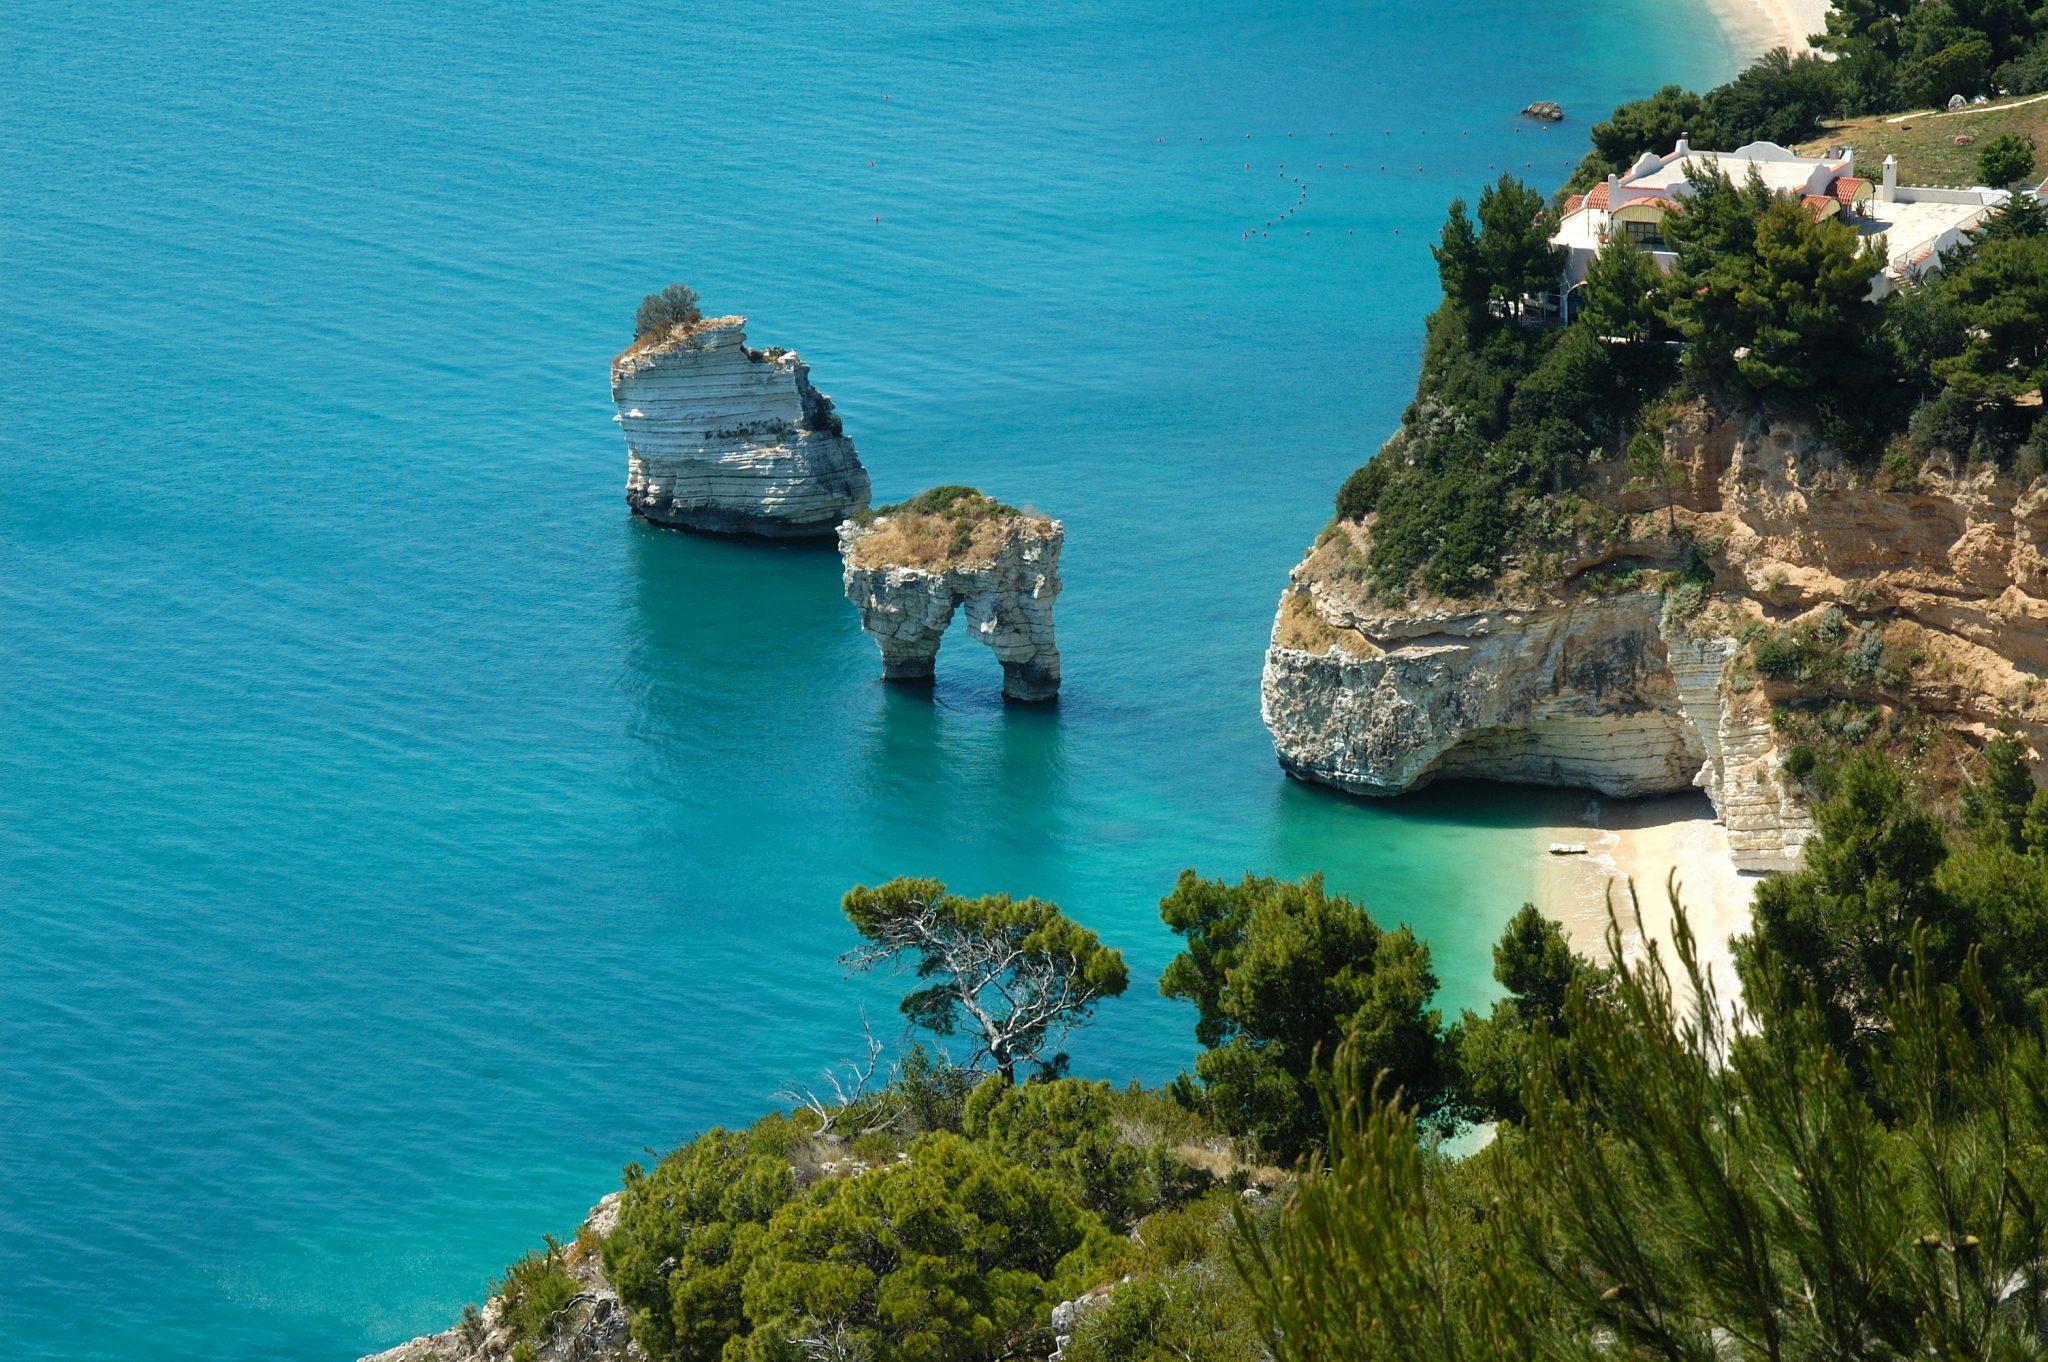 Yoga Retreat Holiday to Southern Italy -MitaShah